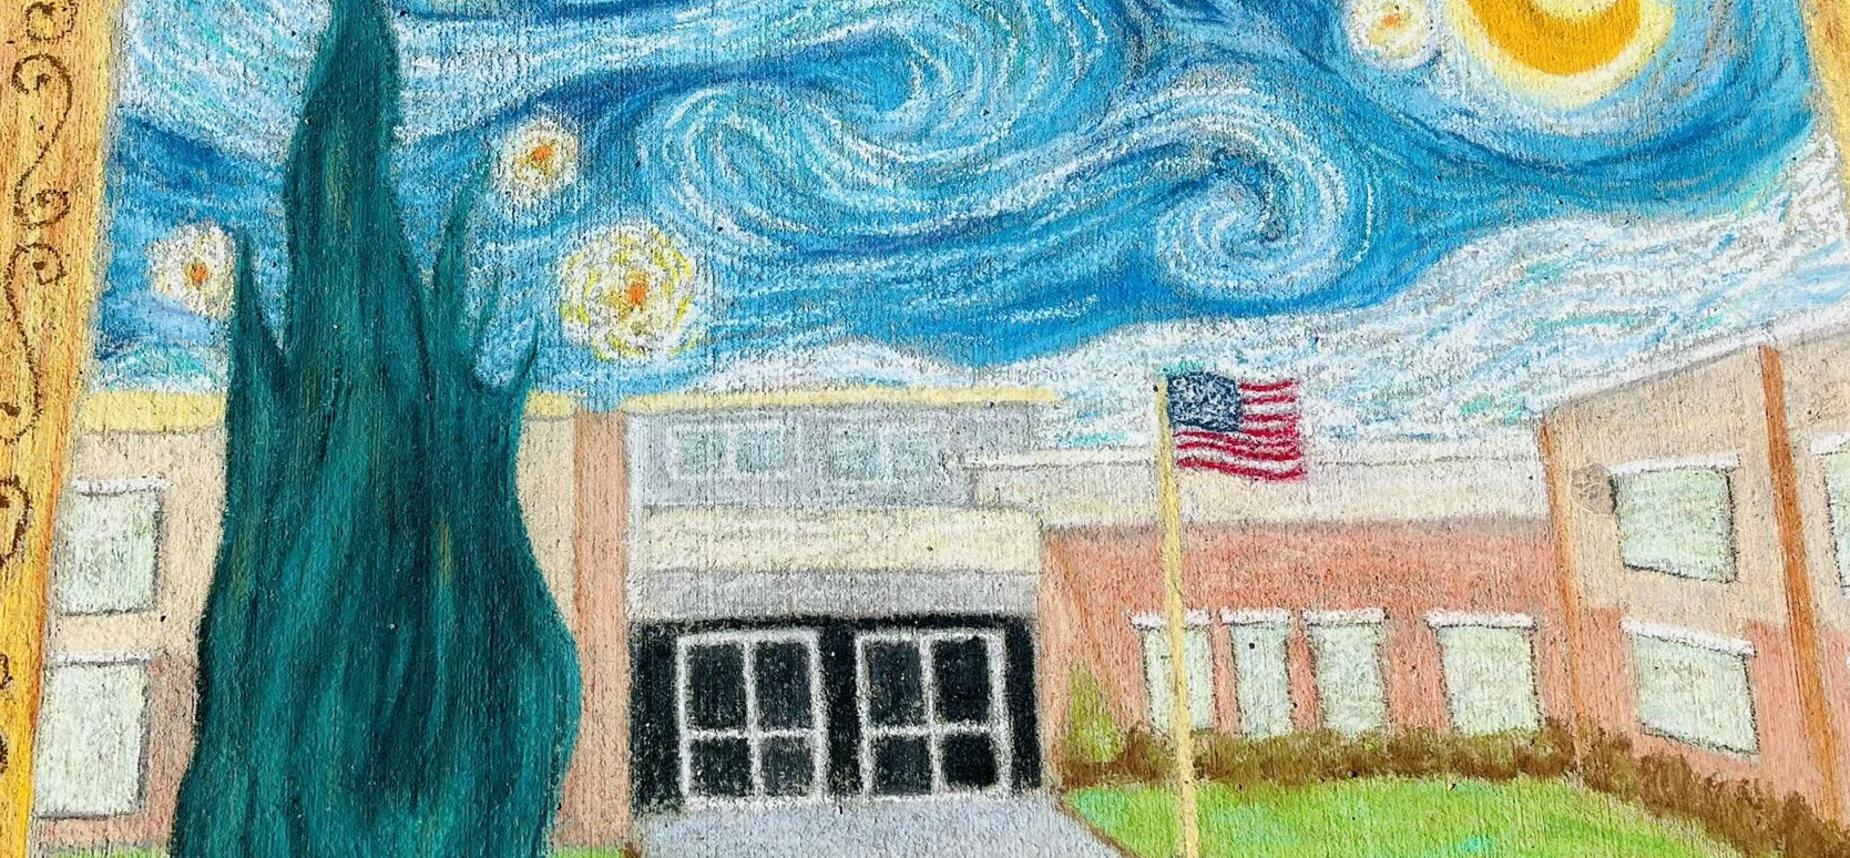 legacy preparatory academy best charter school in utah chalk art on sidewalk composition of the school